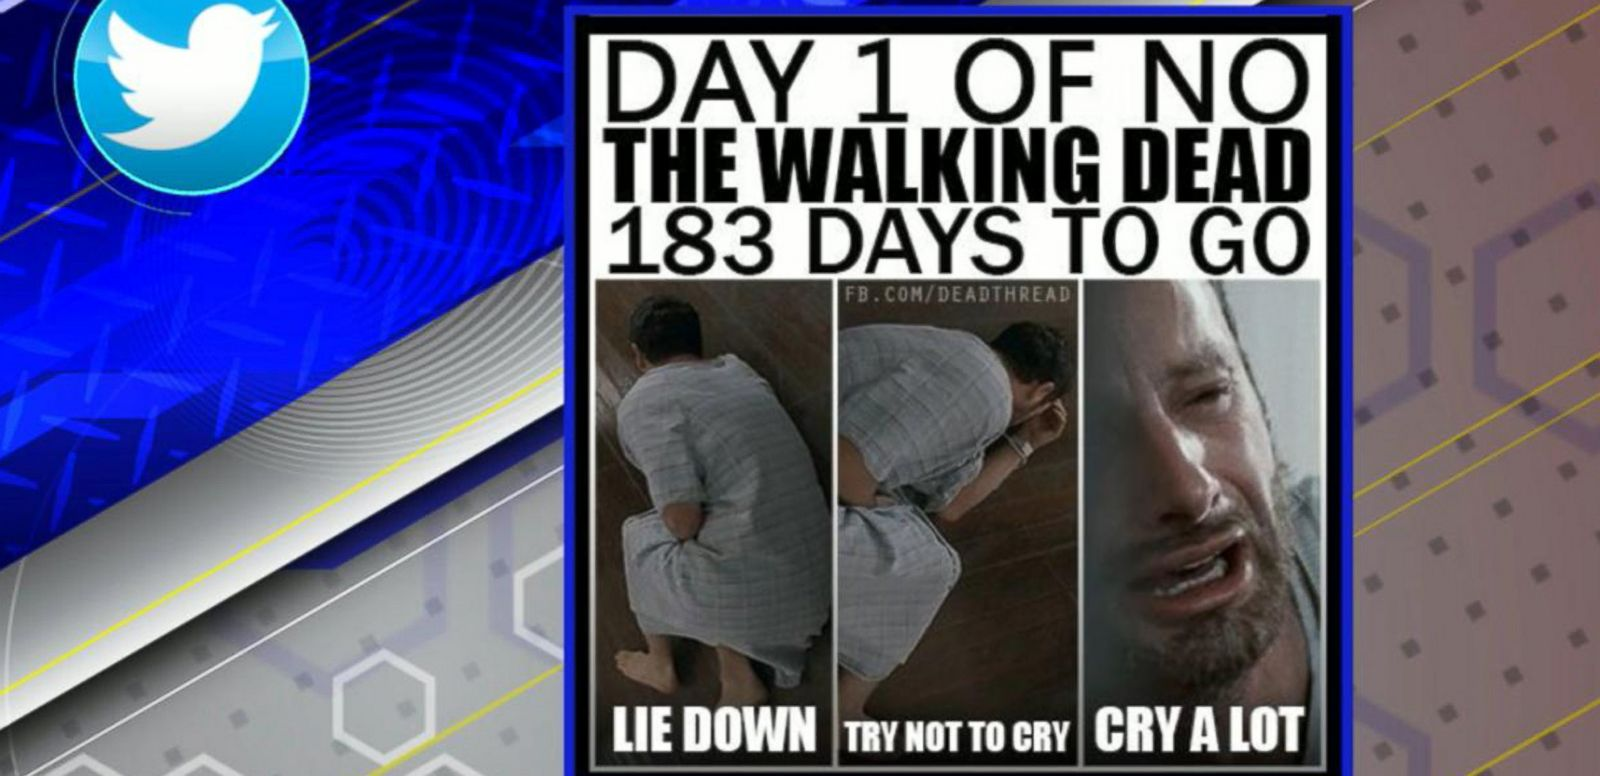 VIDEO: 'The Walking Dead' Fans Take to Social Media After Season Ender